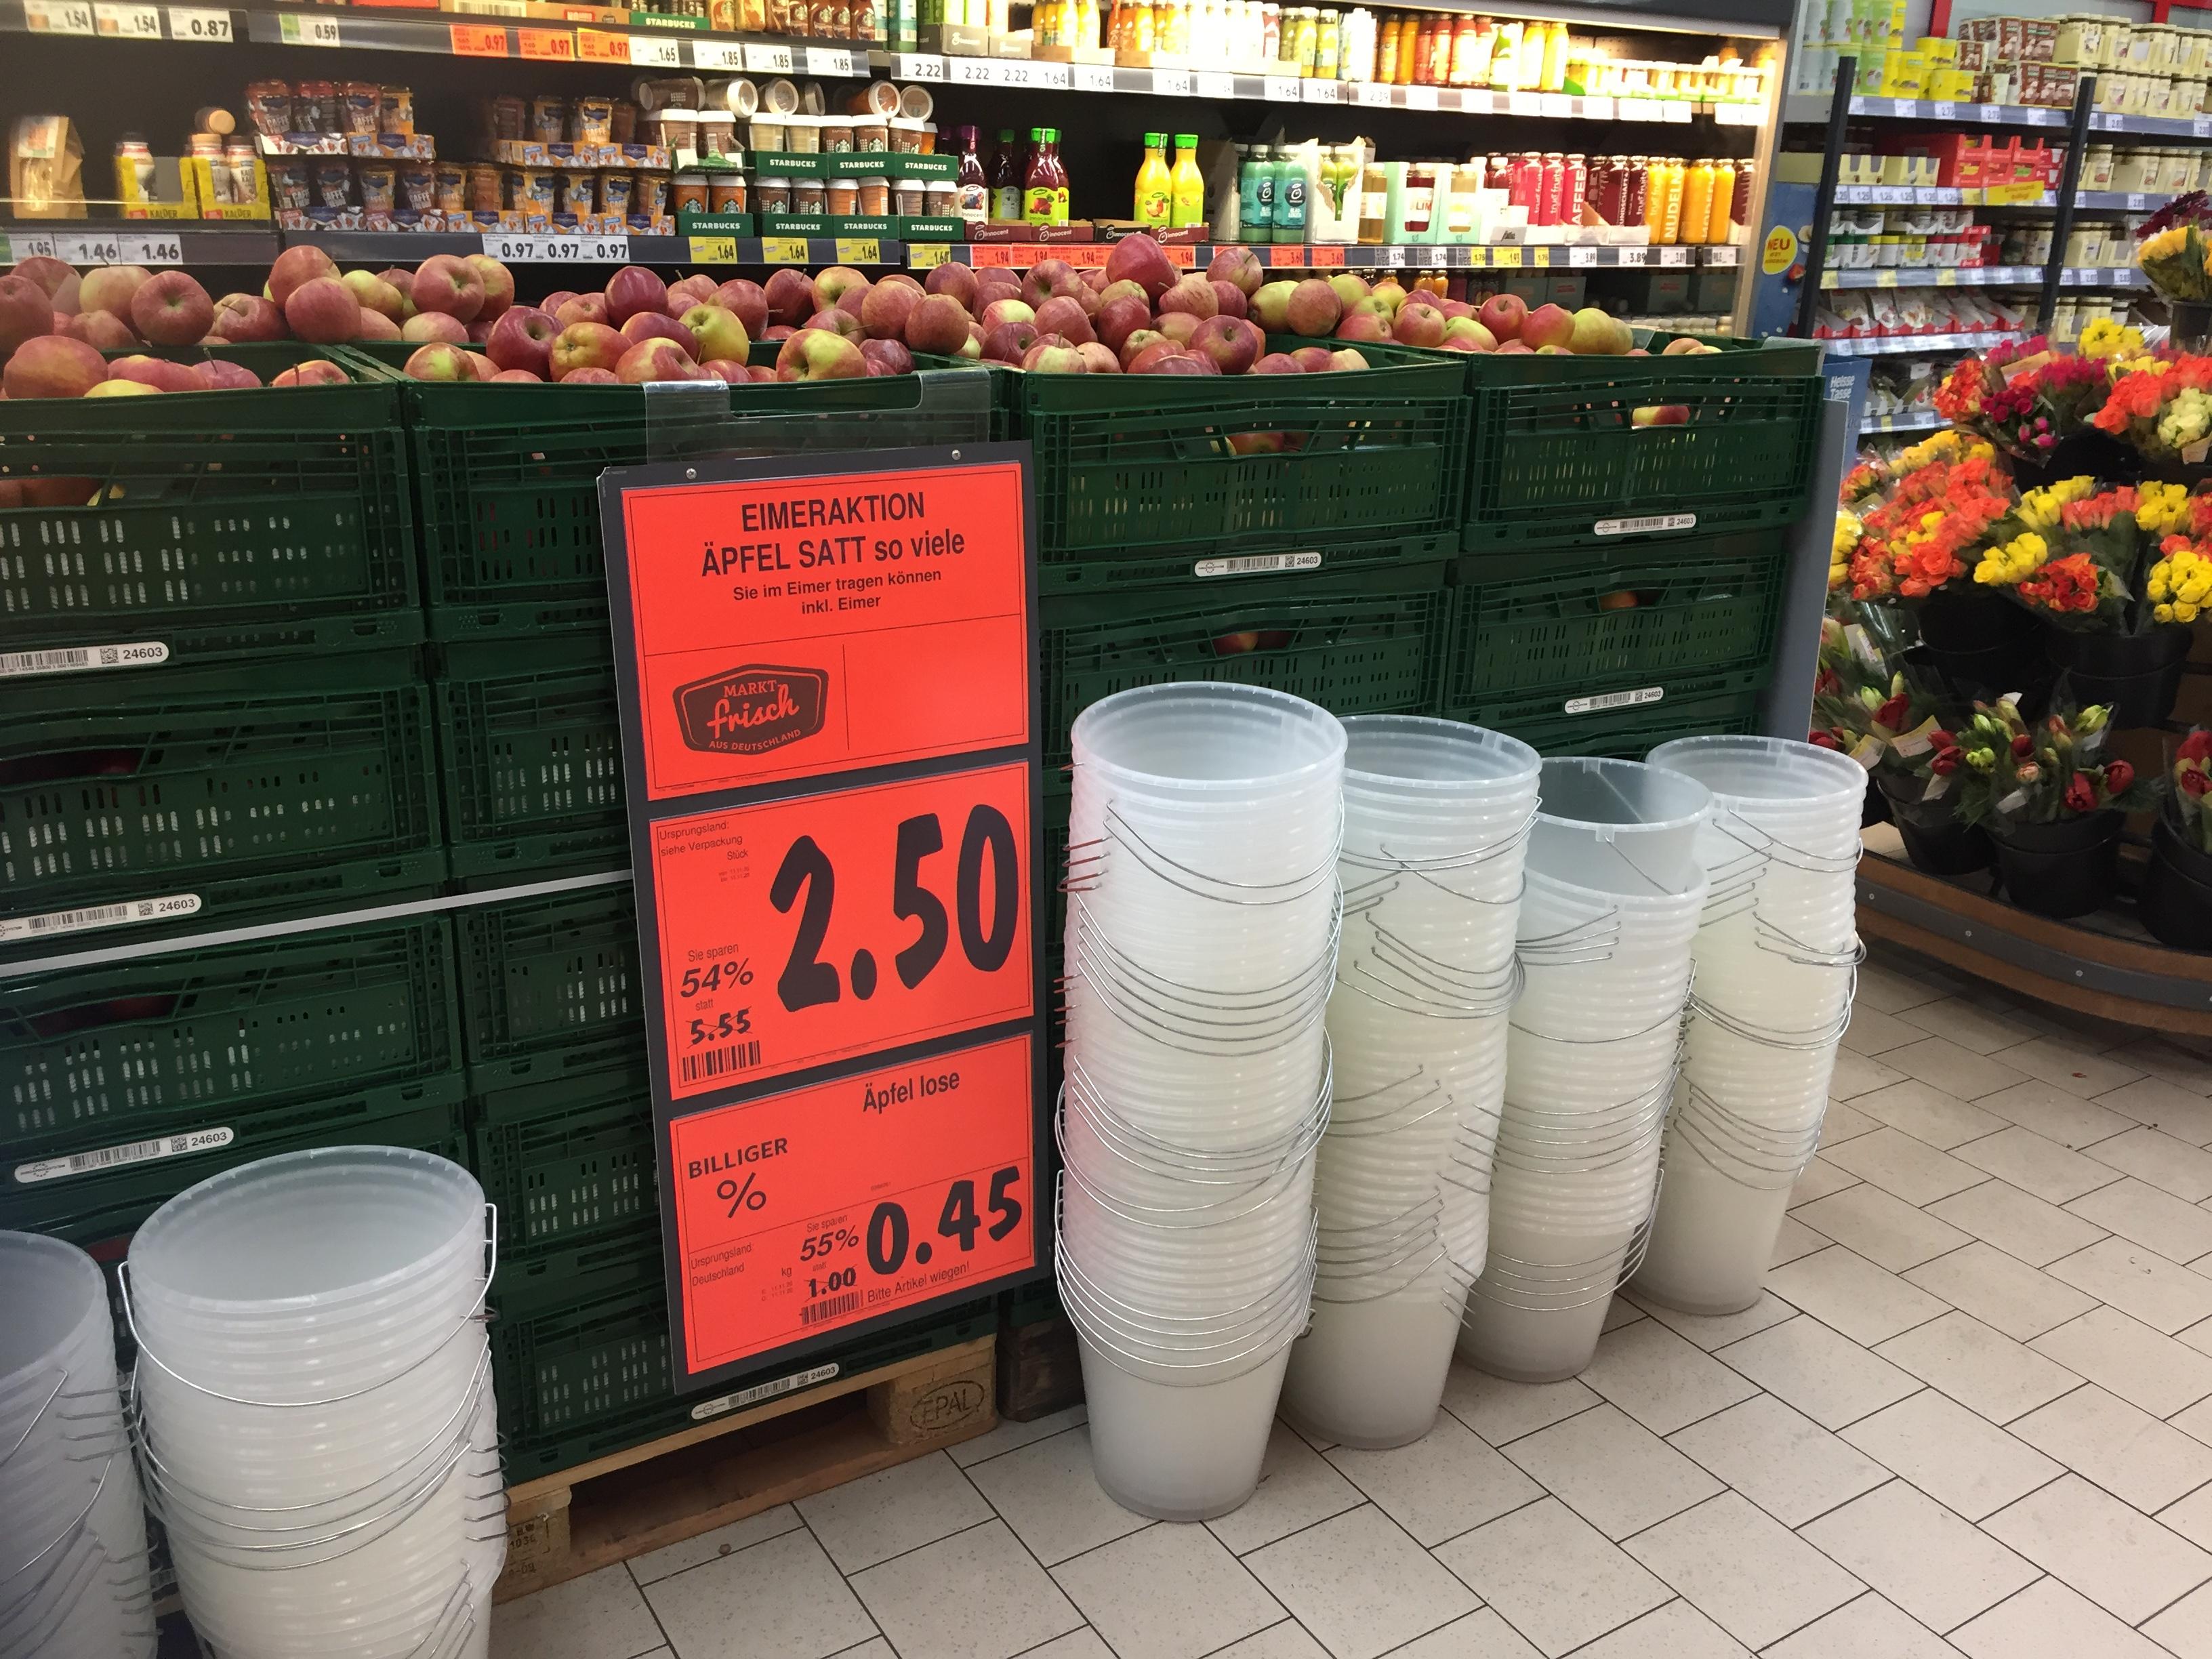 (Lokal) Kaufland Berlin Marzahn Äpfel Eimer Aktion 2,50€